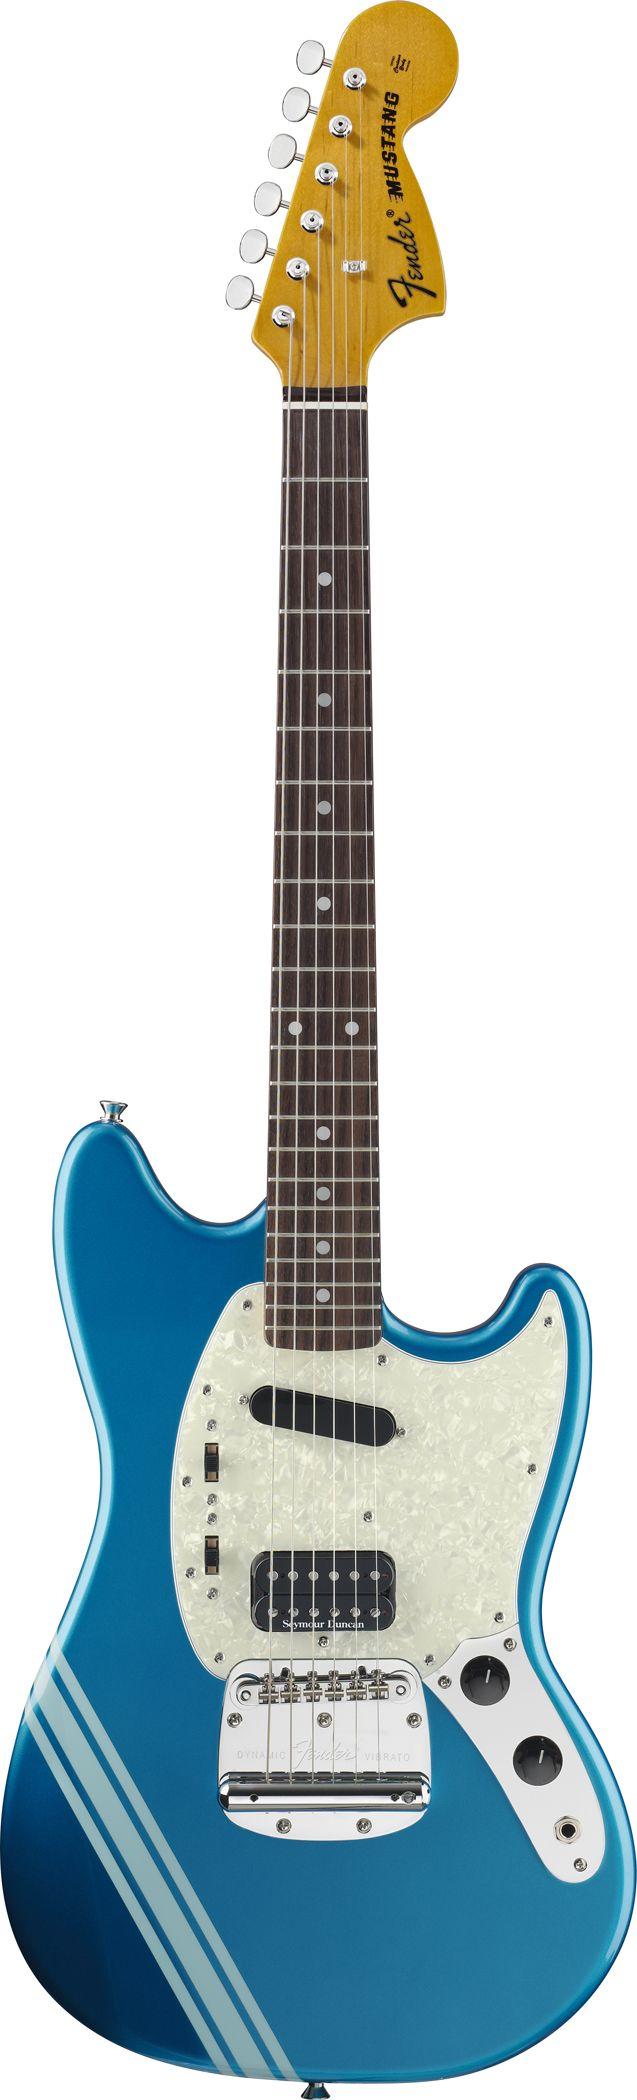 Fender Kurt Cobain Mustang (Lake Placid Blue with Stripe)